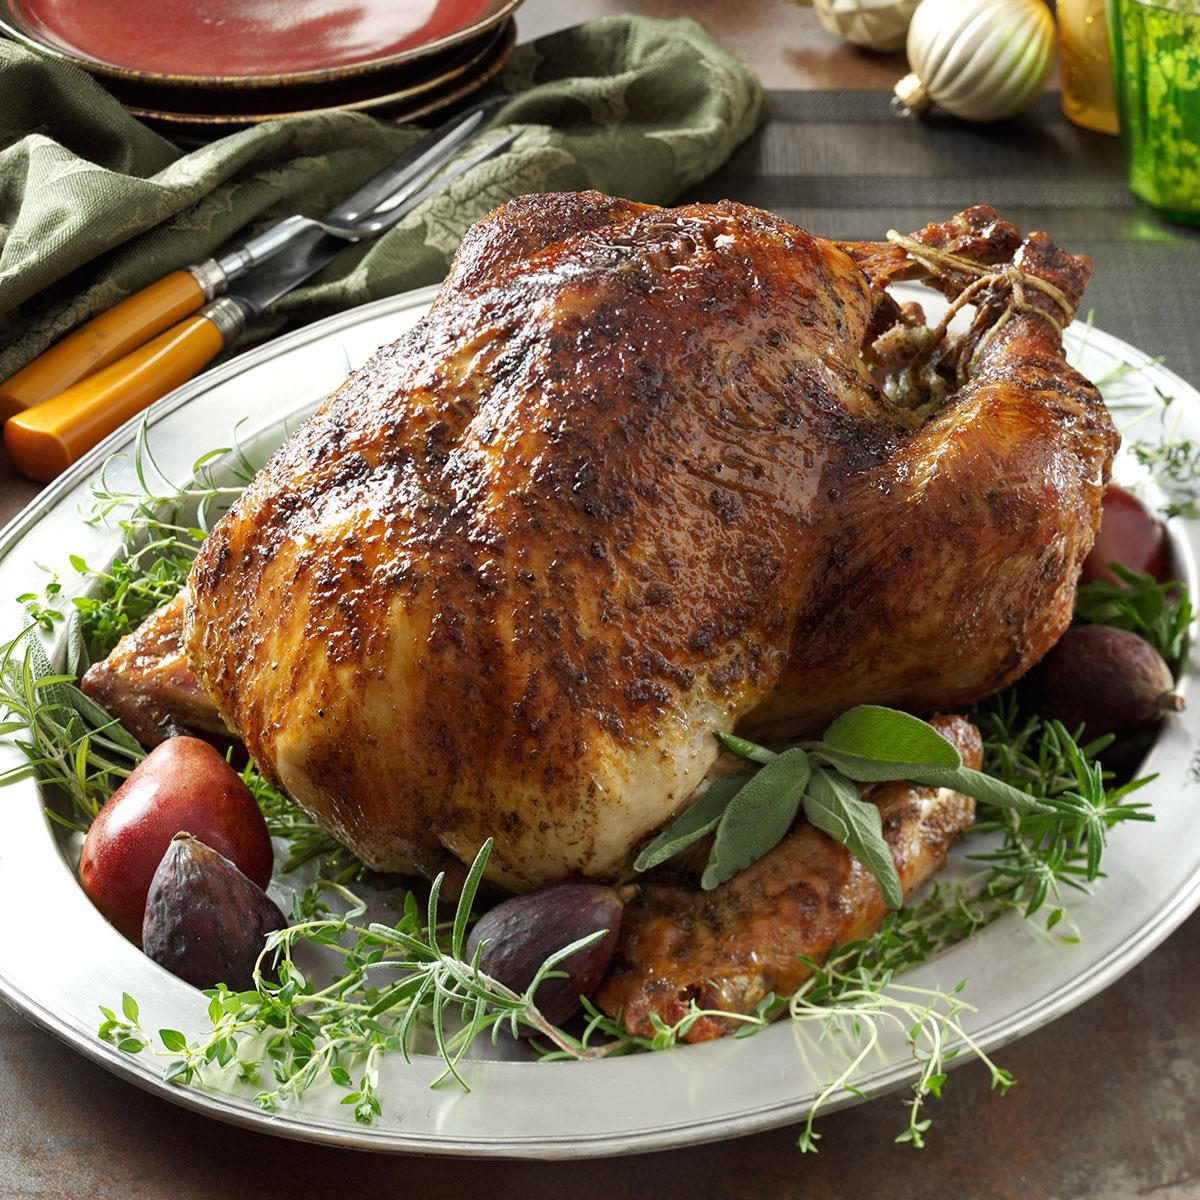 Herb brined turkey